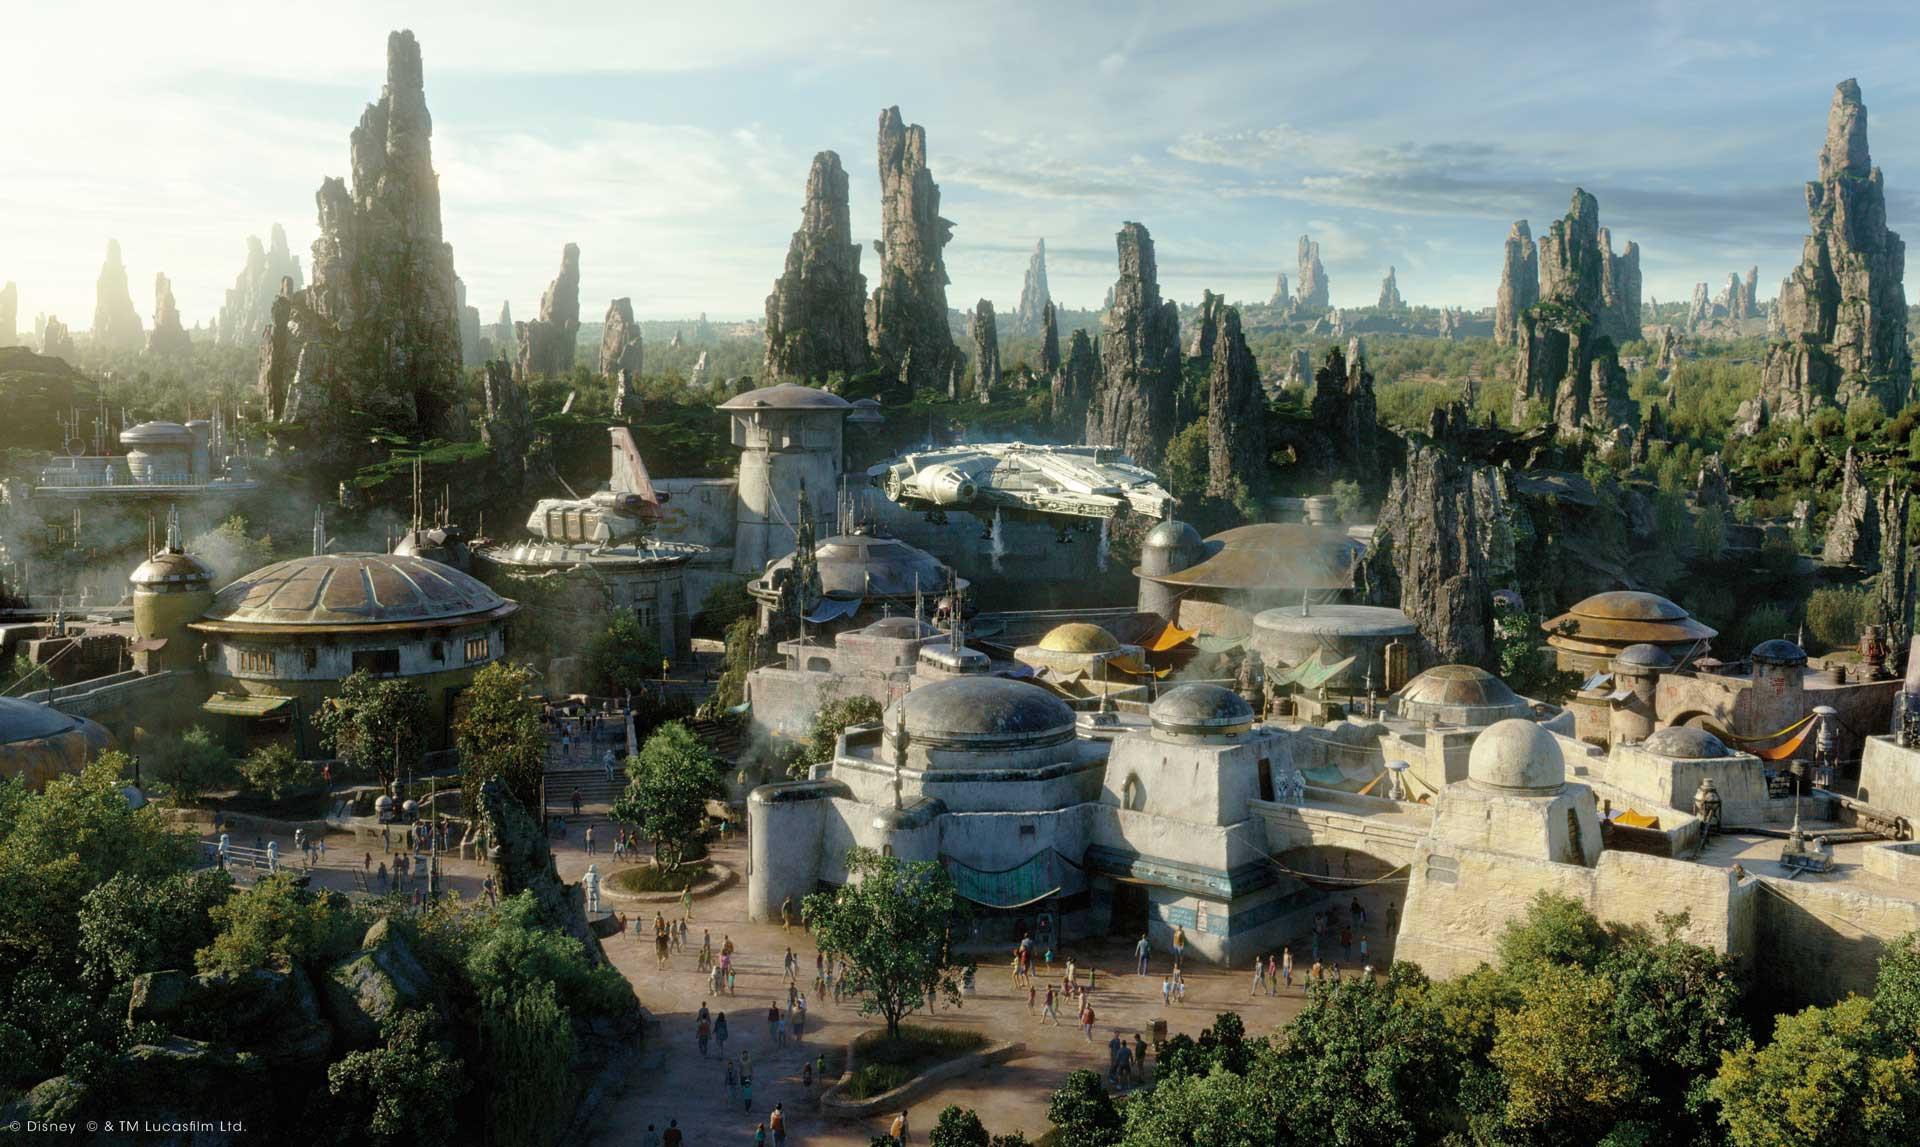 | Star Wars: Galaxy's Edge